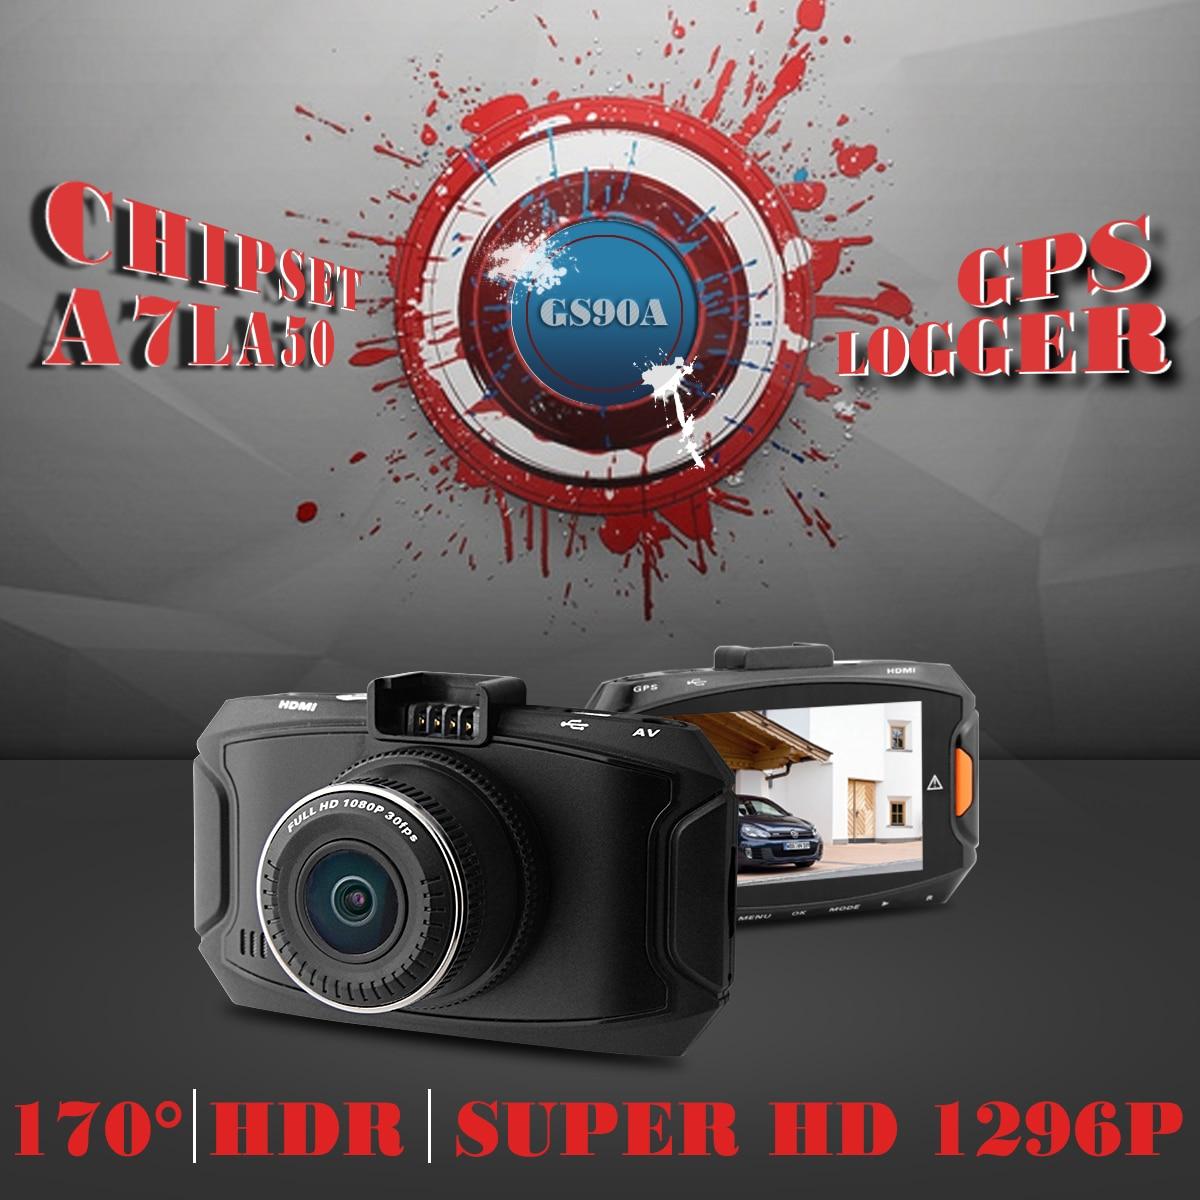 Car Camera Ambarella A7 Car DVR GS90A 1296P Full HD DVR Recorder Dash Cam GPS Logger Night Vision OV4689 Sensor Camcorder 8269